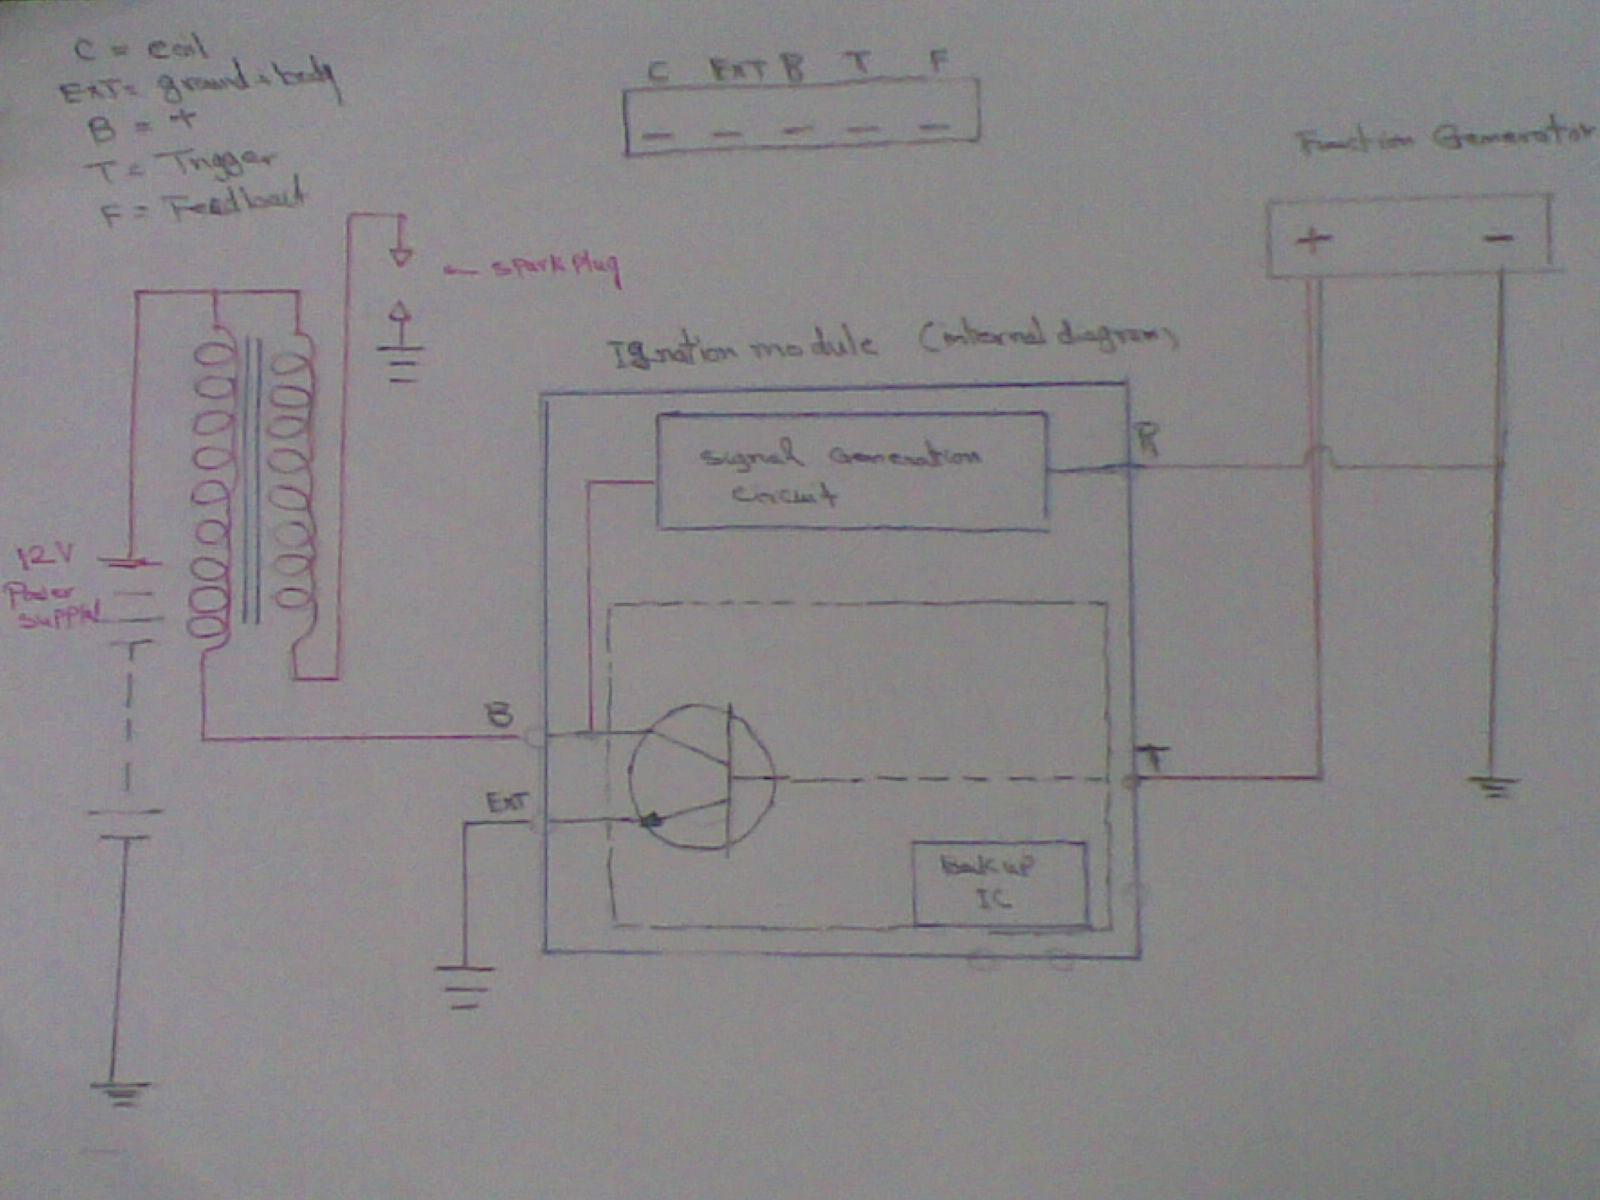 hall effect wiring diagram